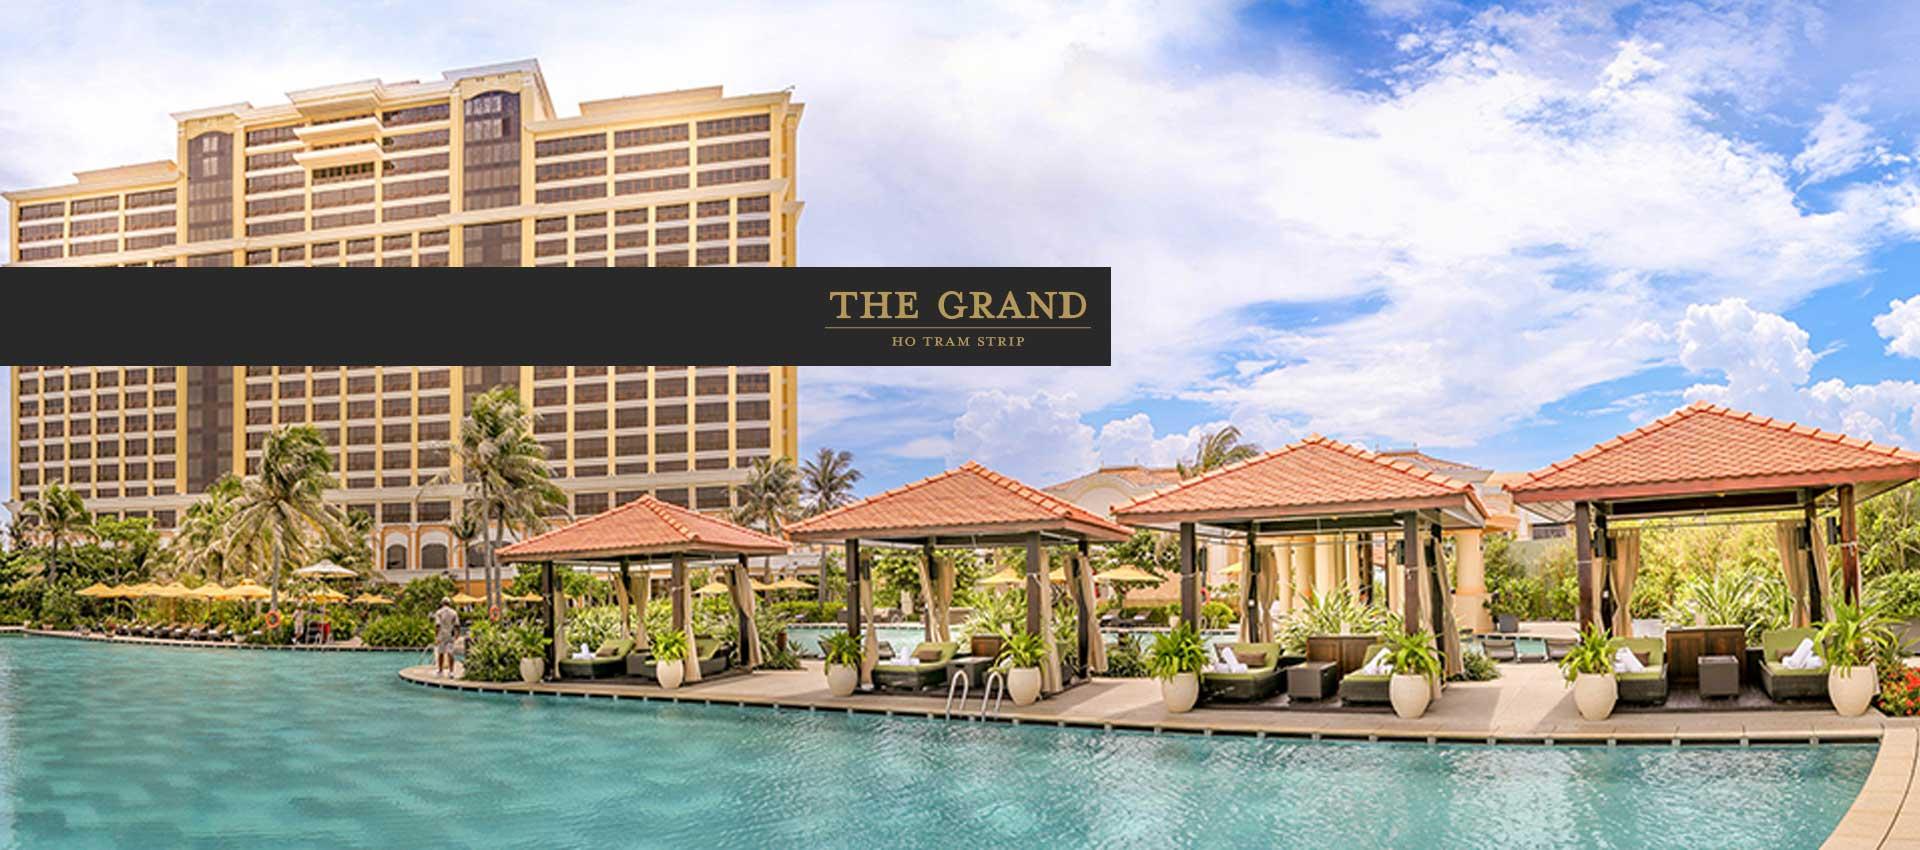 The Grand - Ho Tram Strip Resort